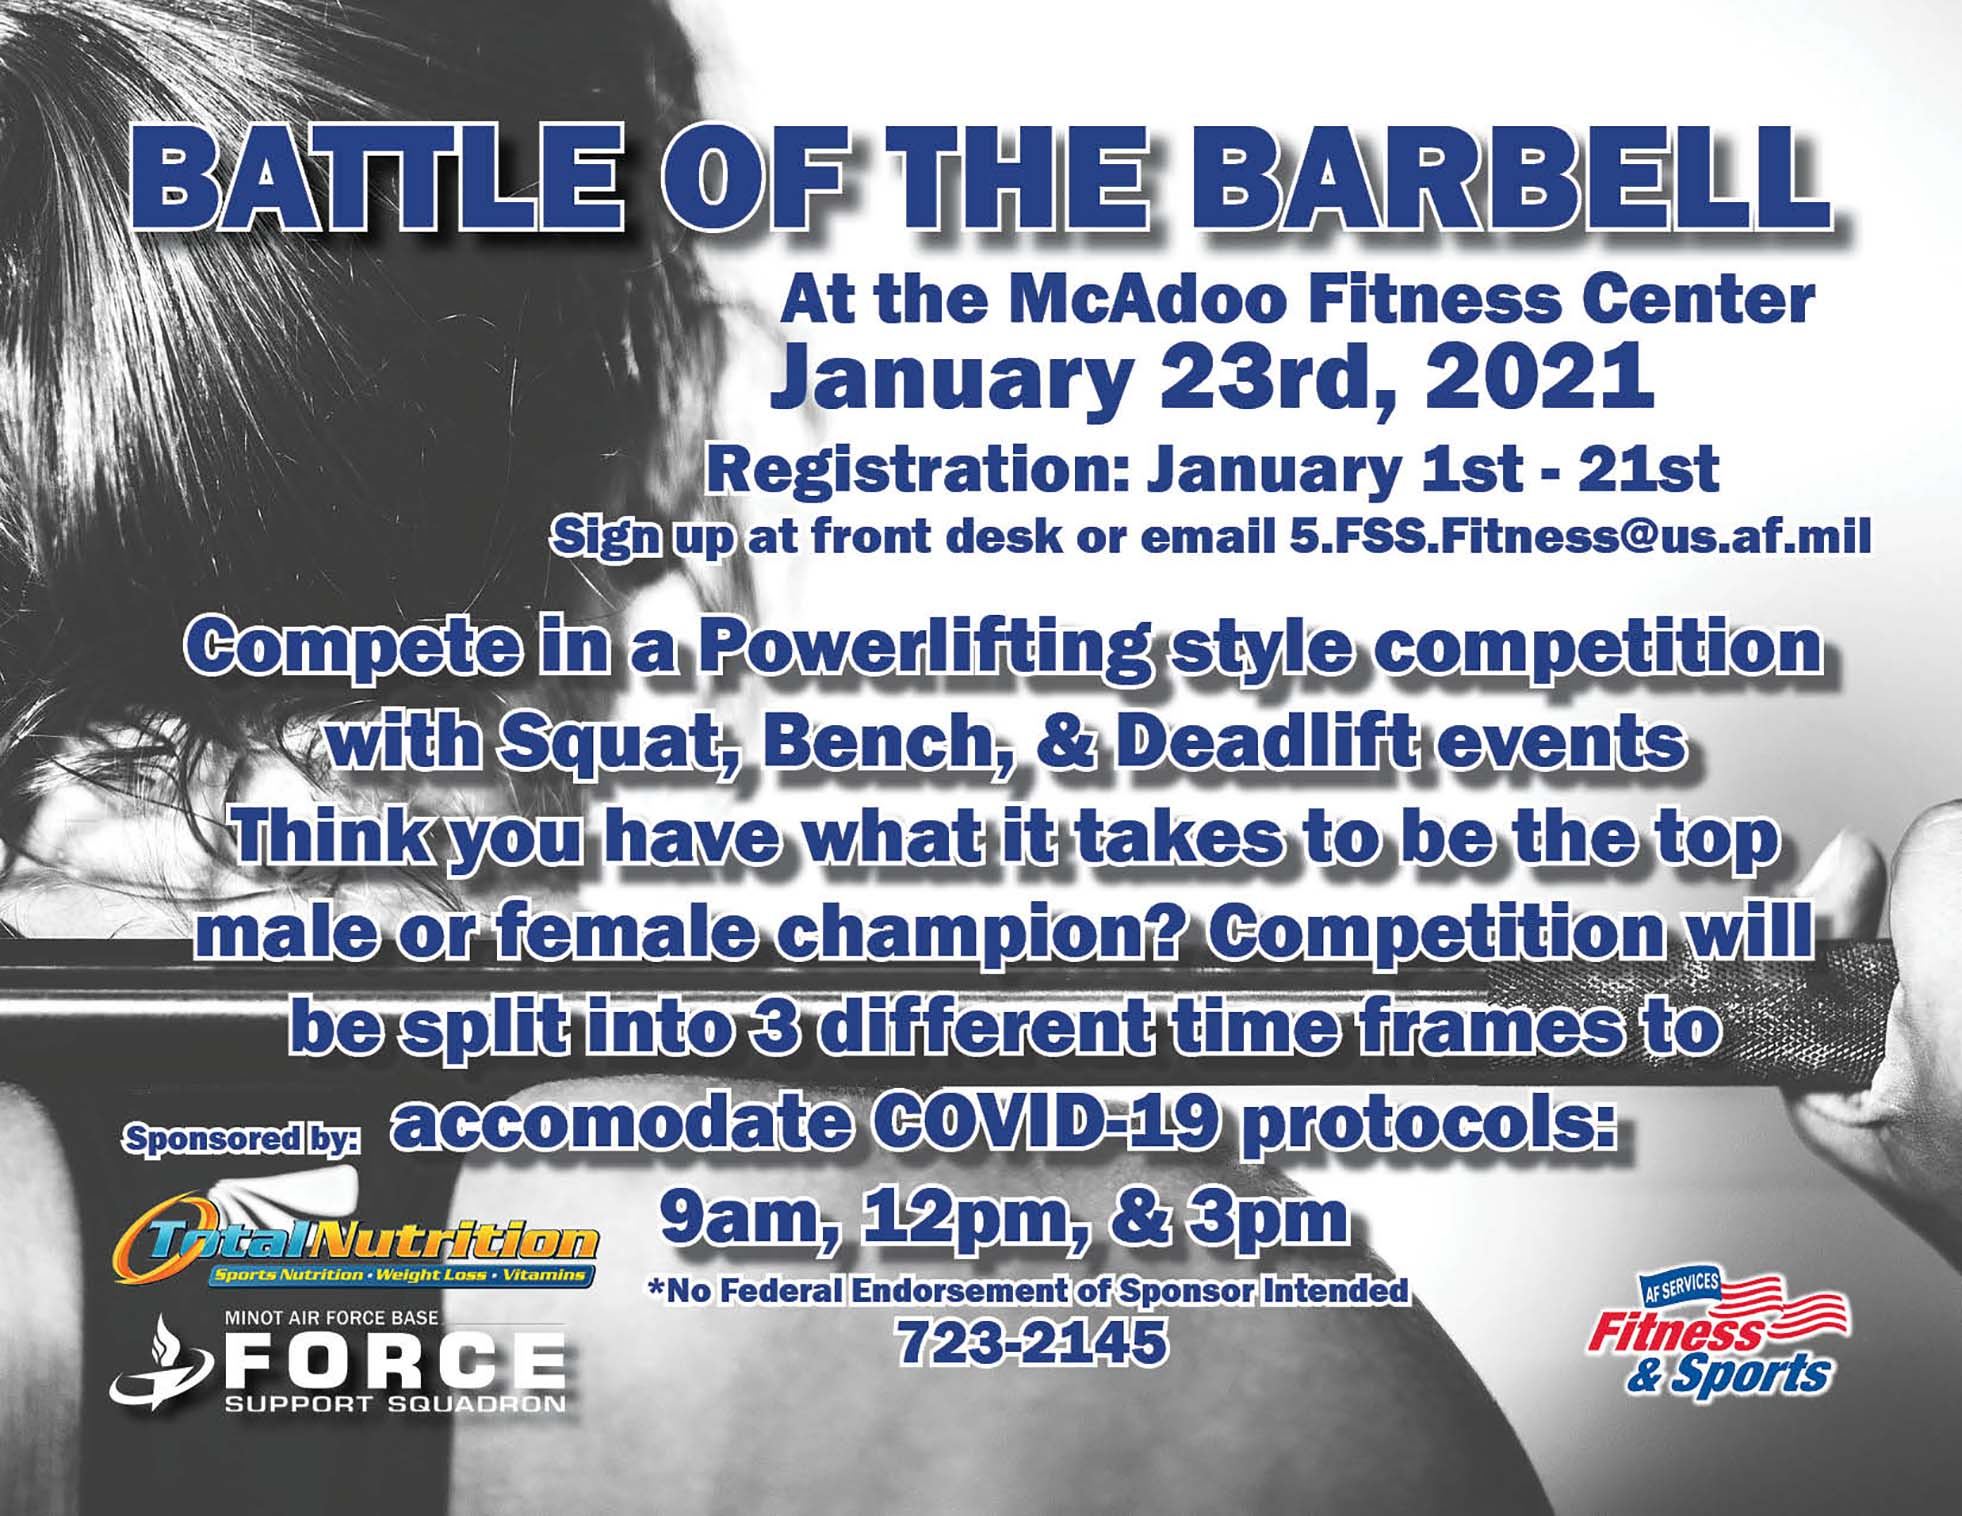 Registration Ends: Battle of the Barbell